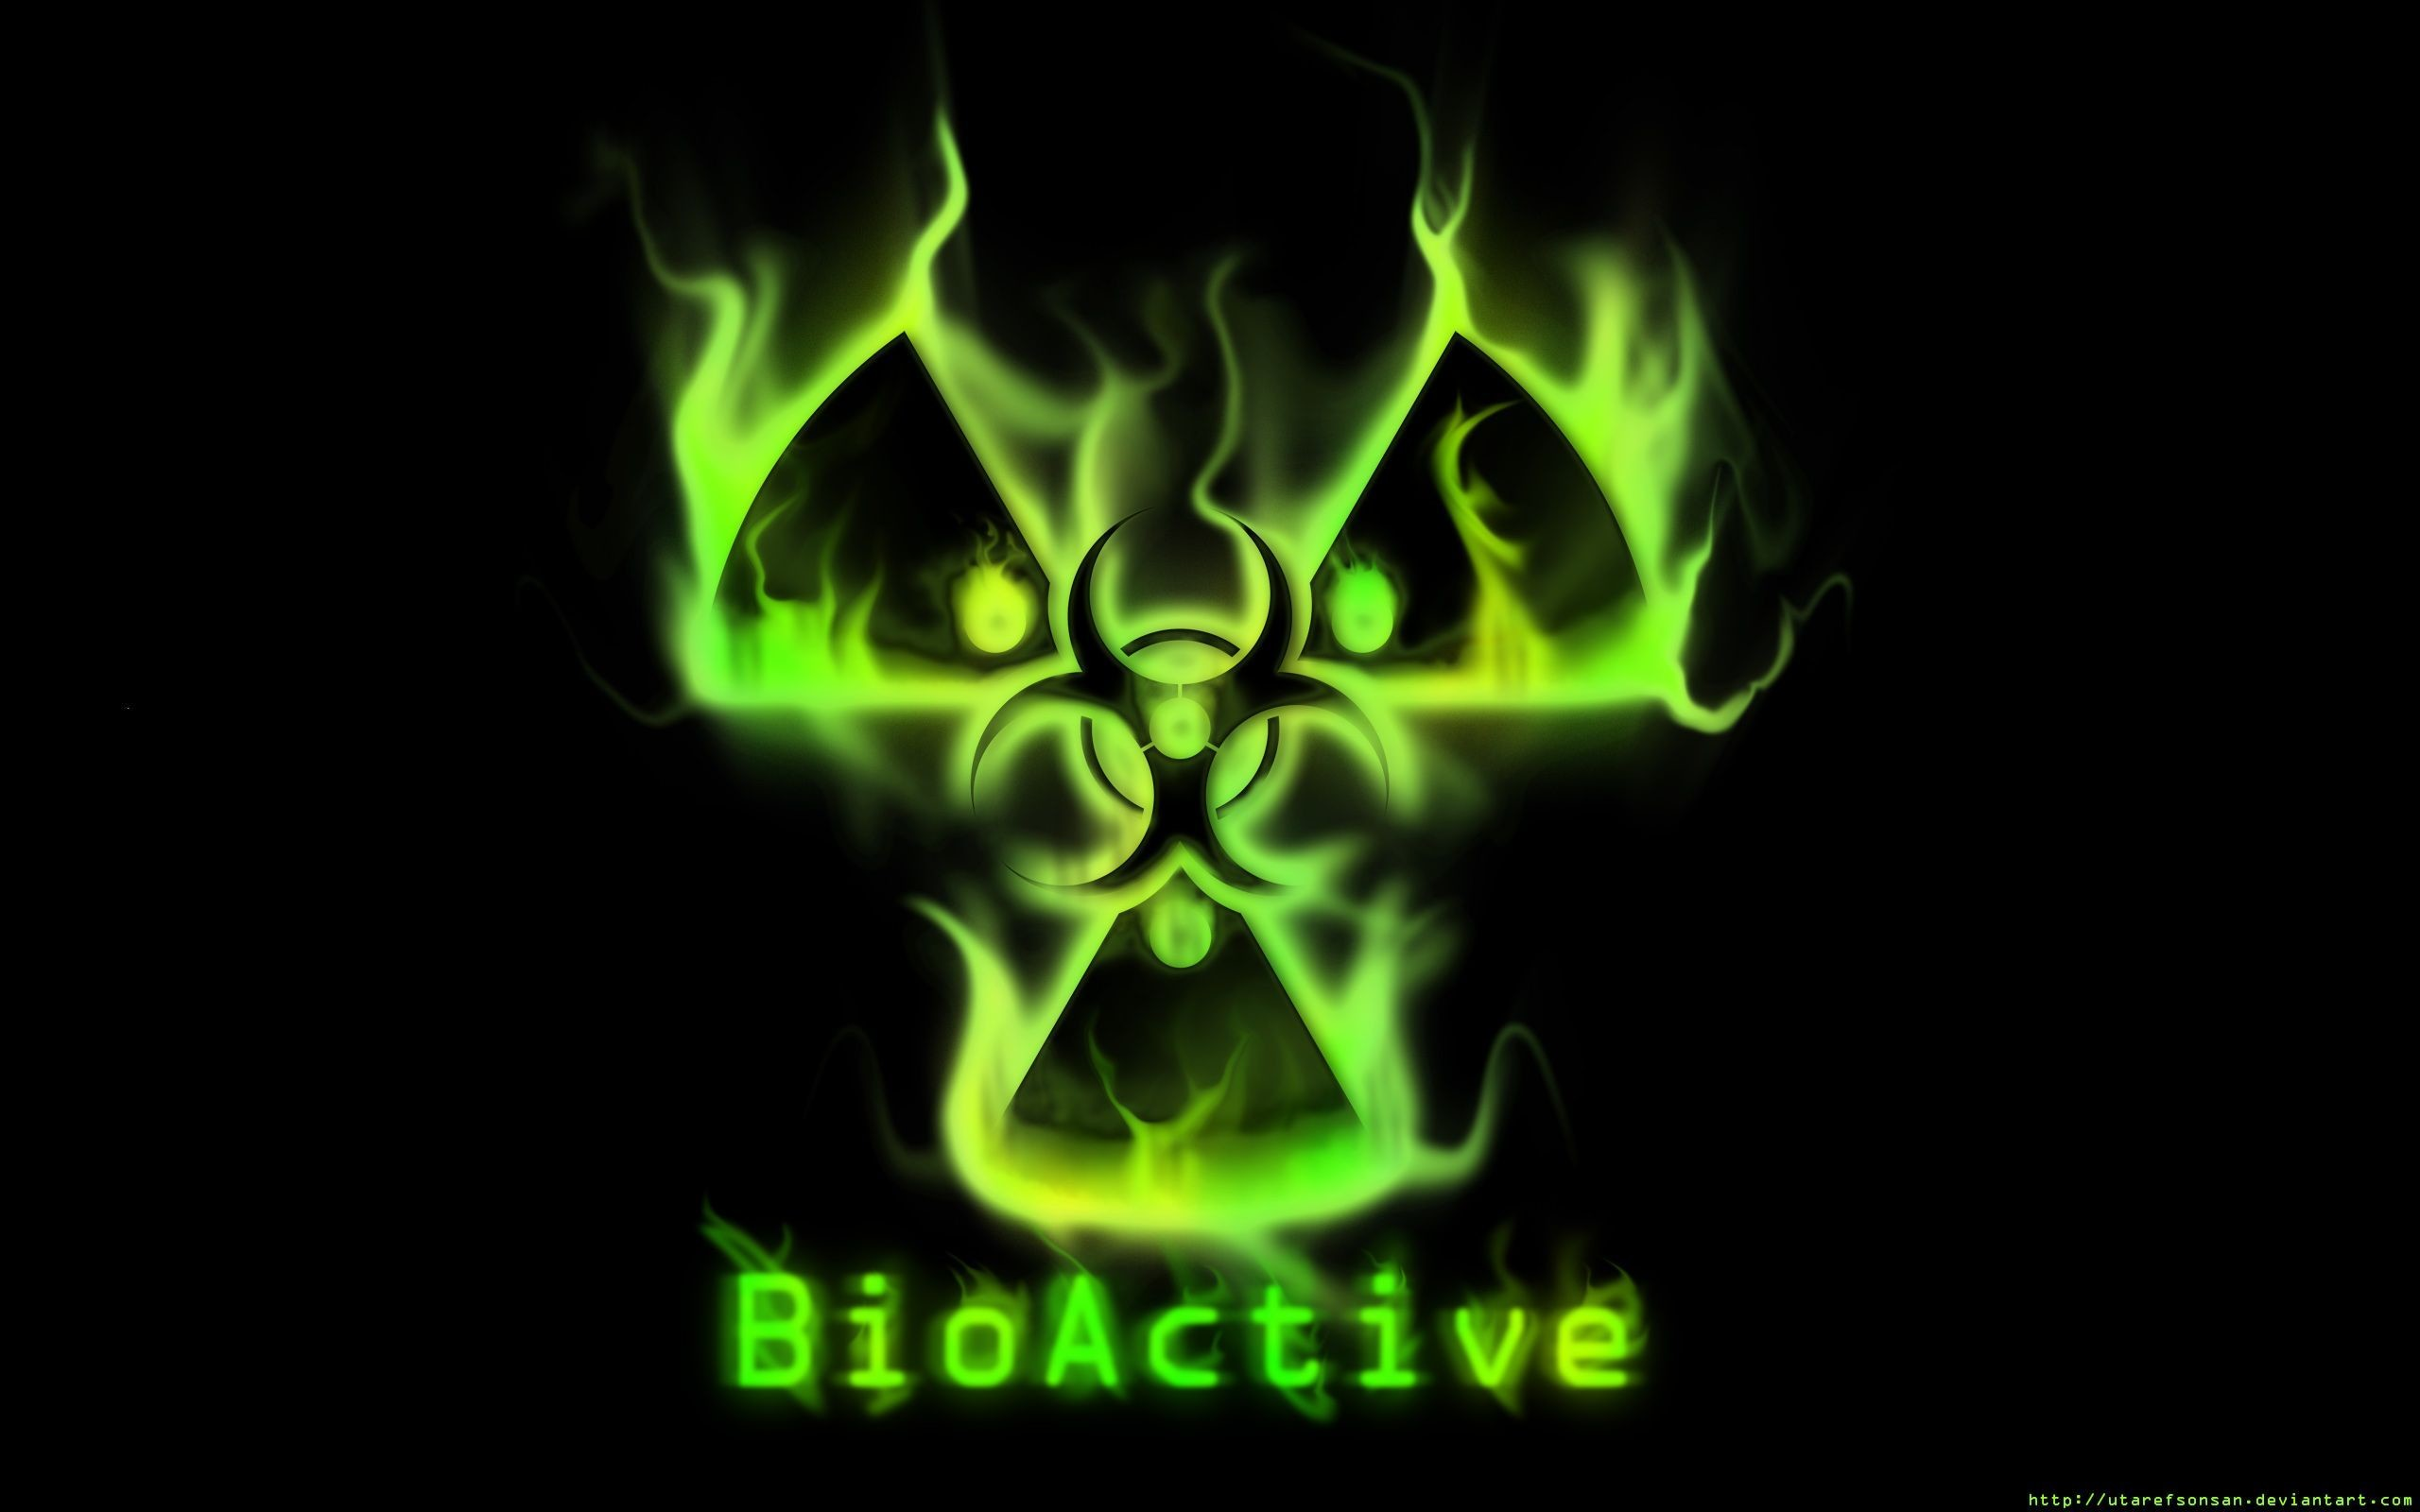 radiation symbol wallpaper 49 images